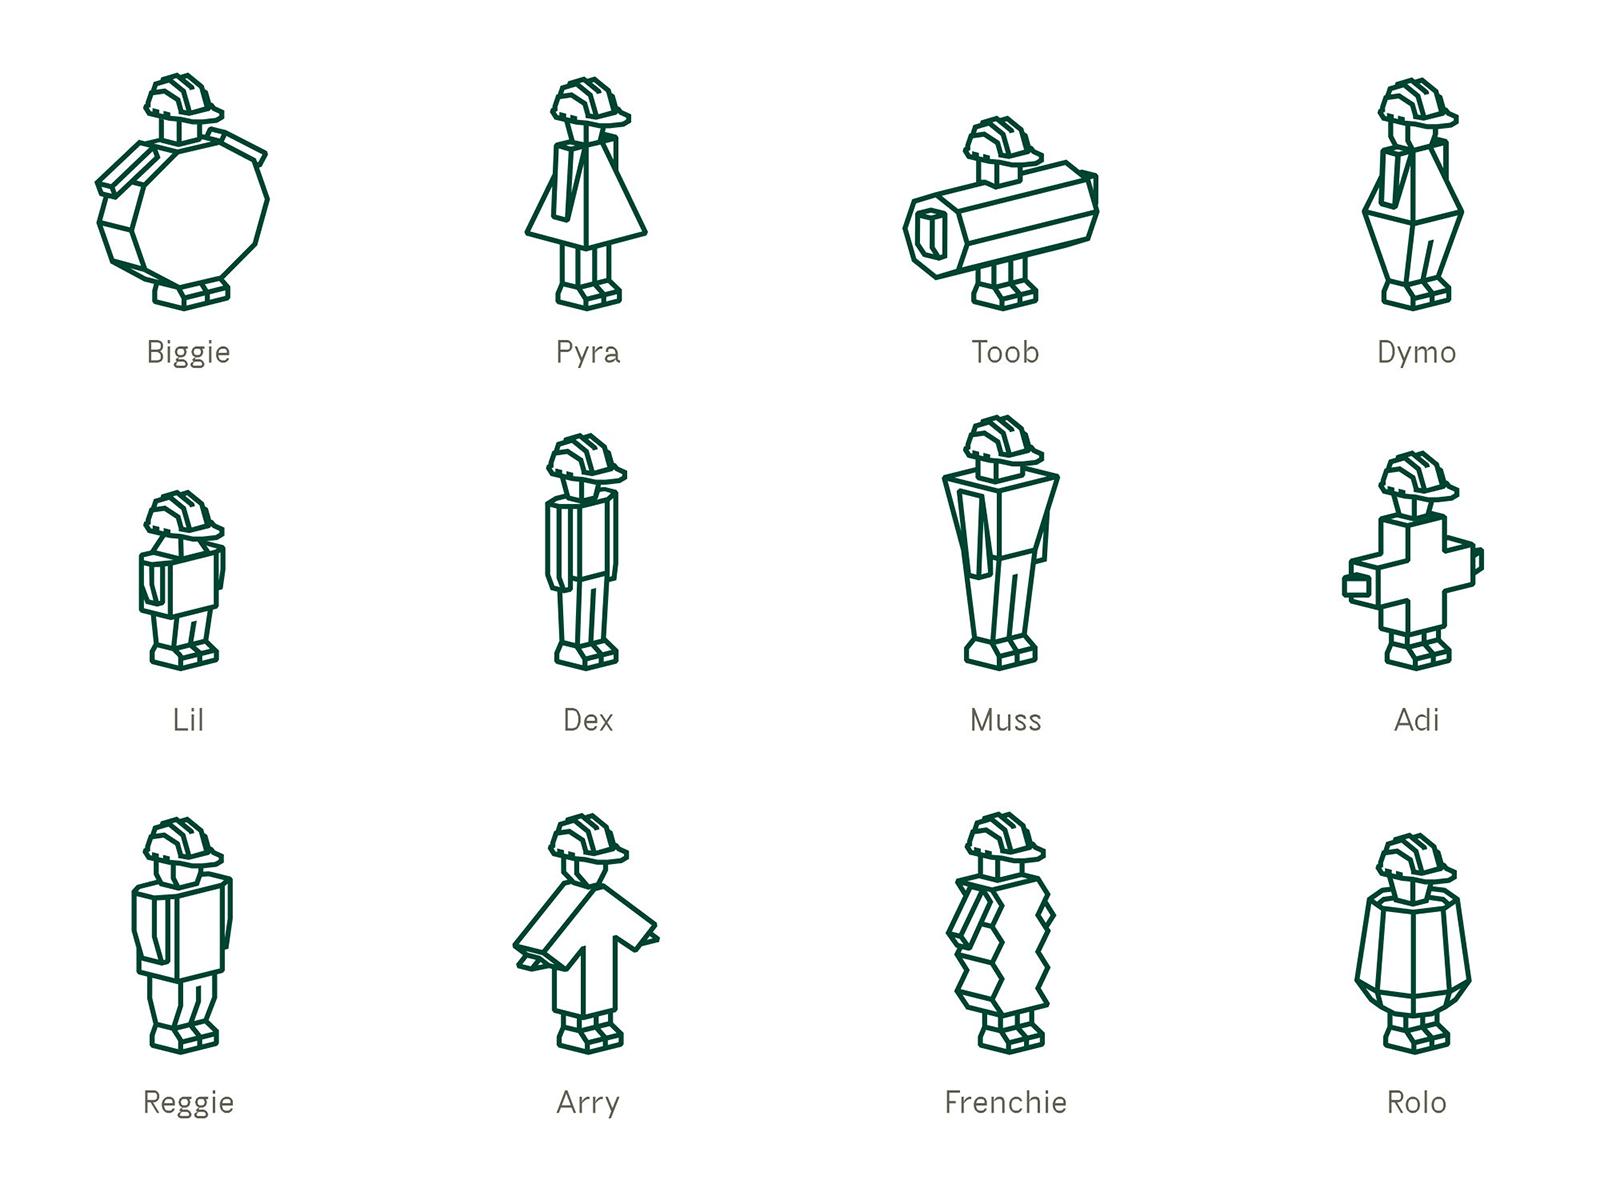 CBRE Build品牌啟動全新的LOGO和視覺VI形象-深圳VI設計3